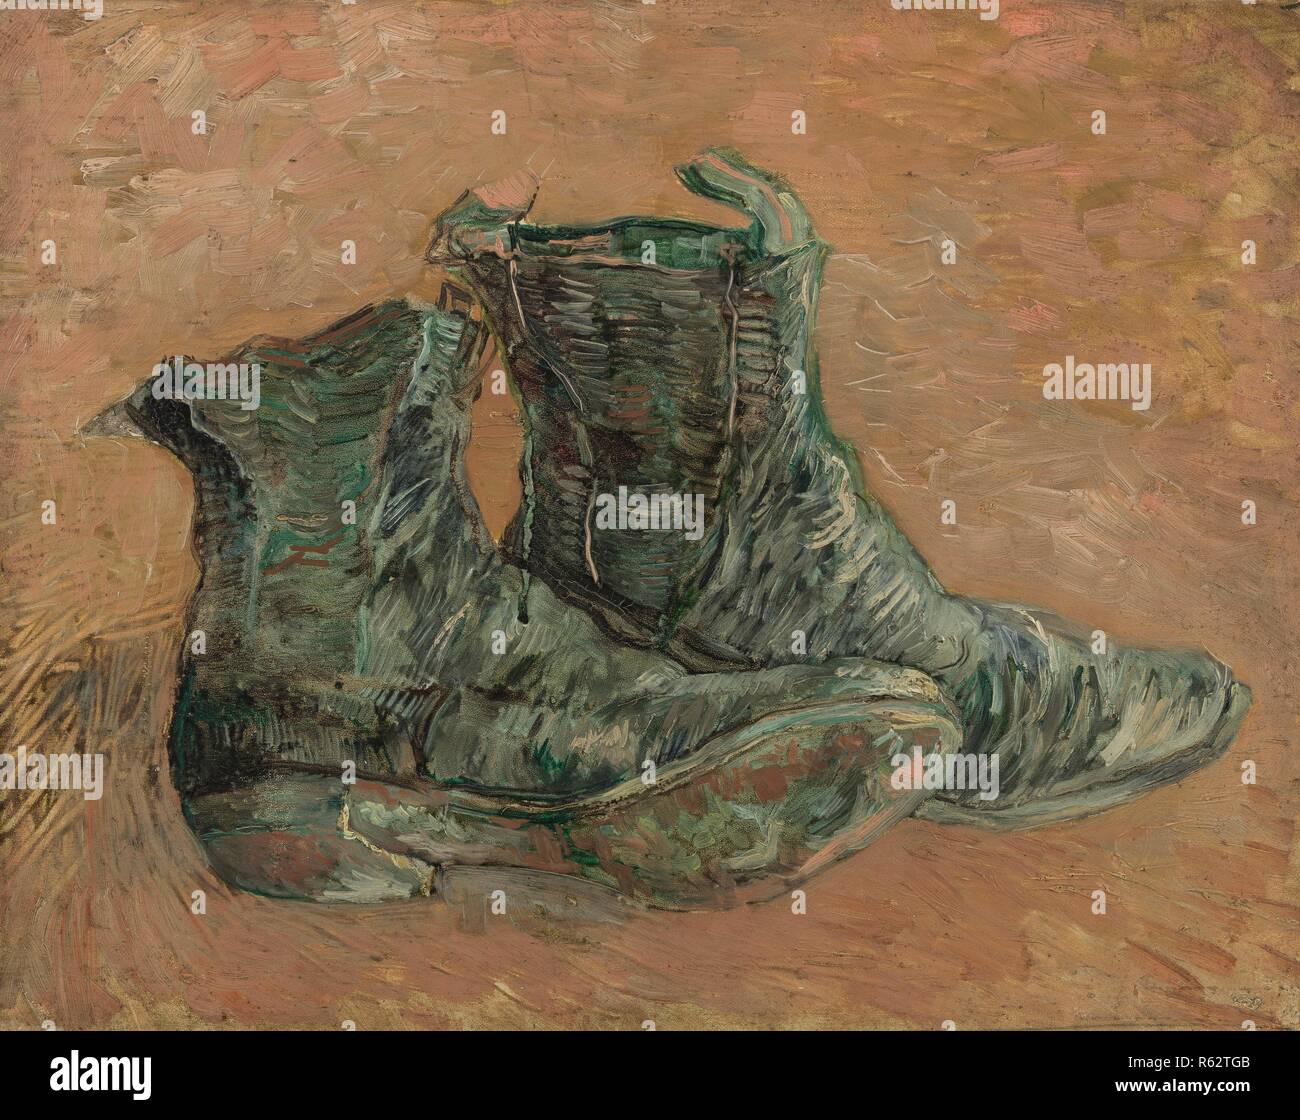 Gogh Alamy Shoes Photosamp; Van Vincent Images 0kOPw8nXN